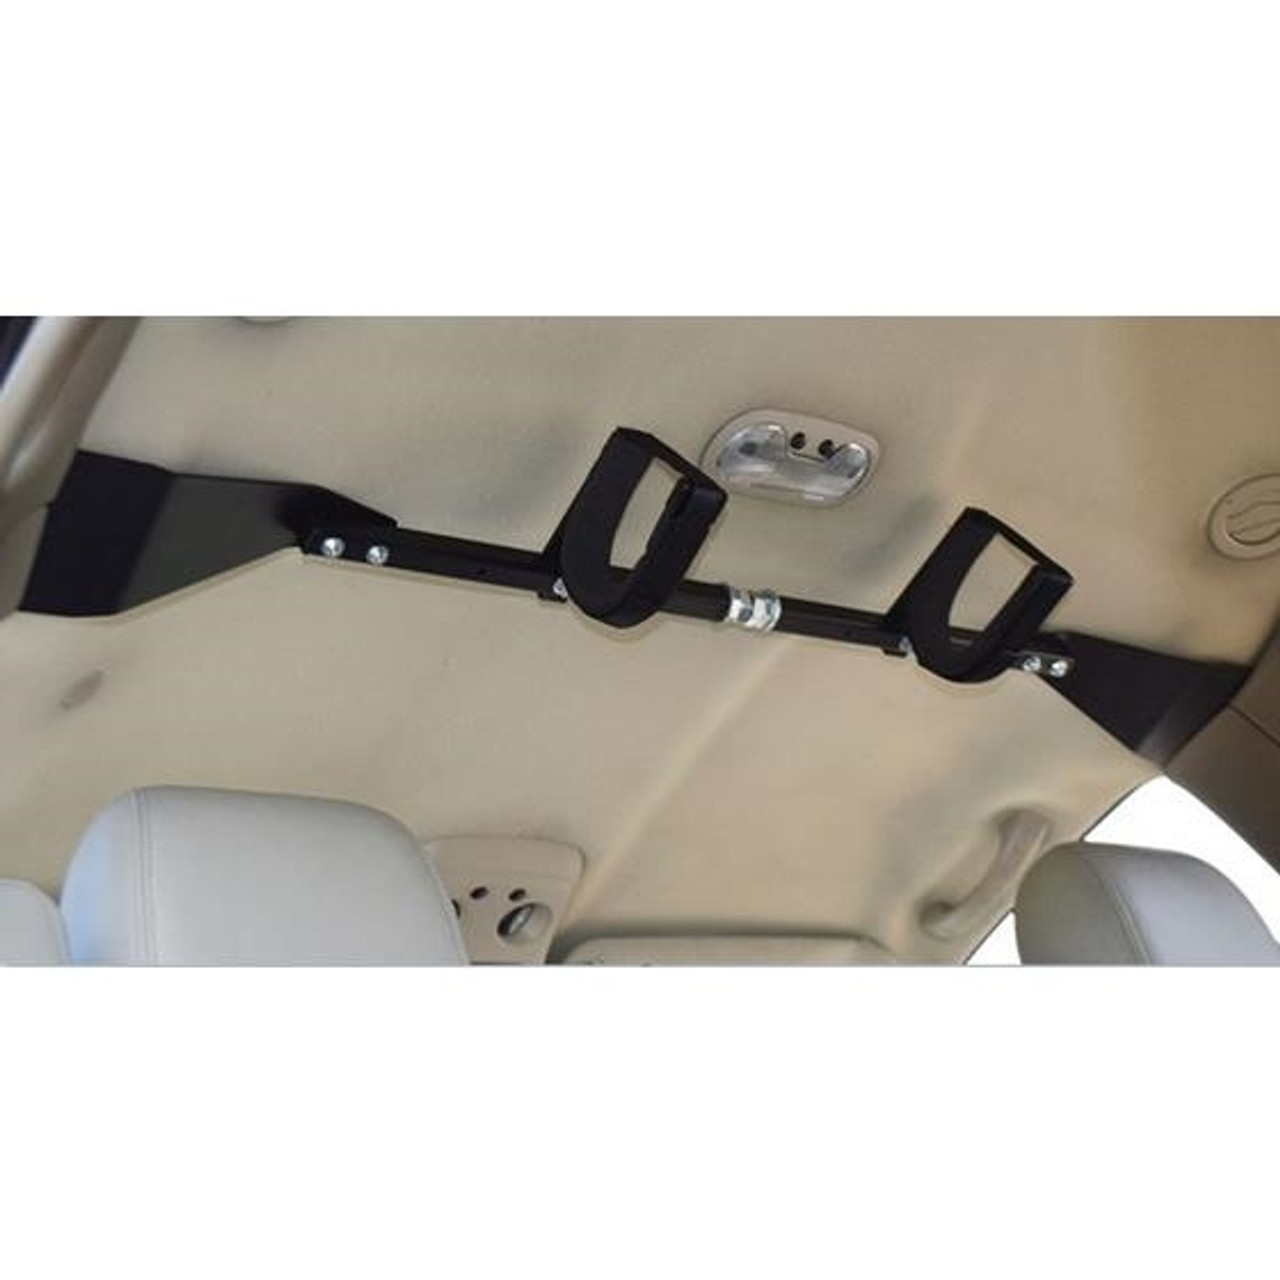 https leonardaccessories com product interior gun storage great day center lok overhead gun rack